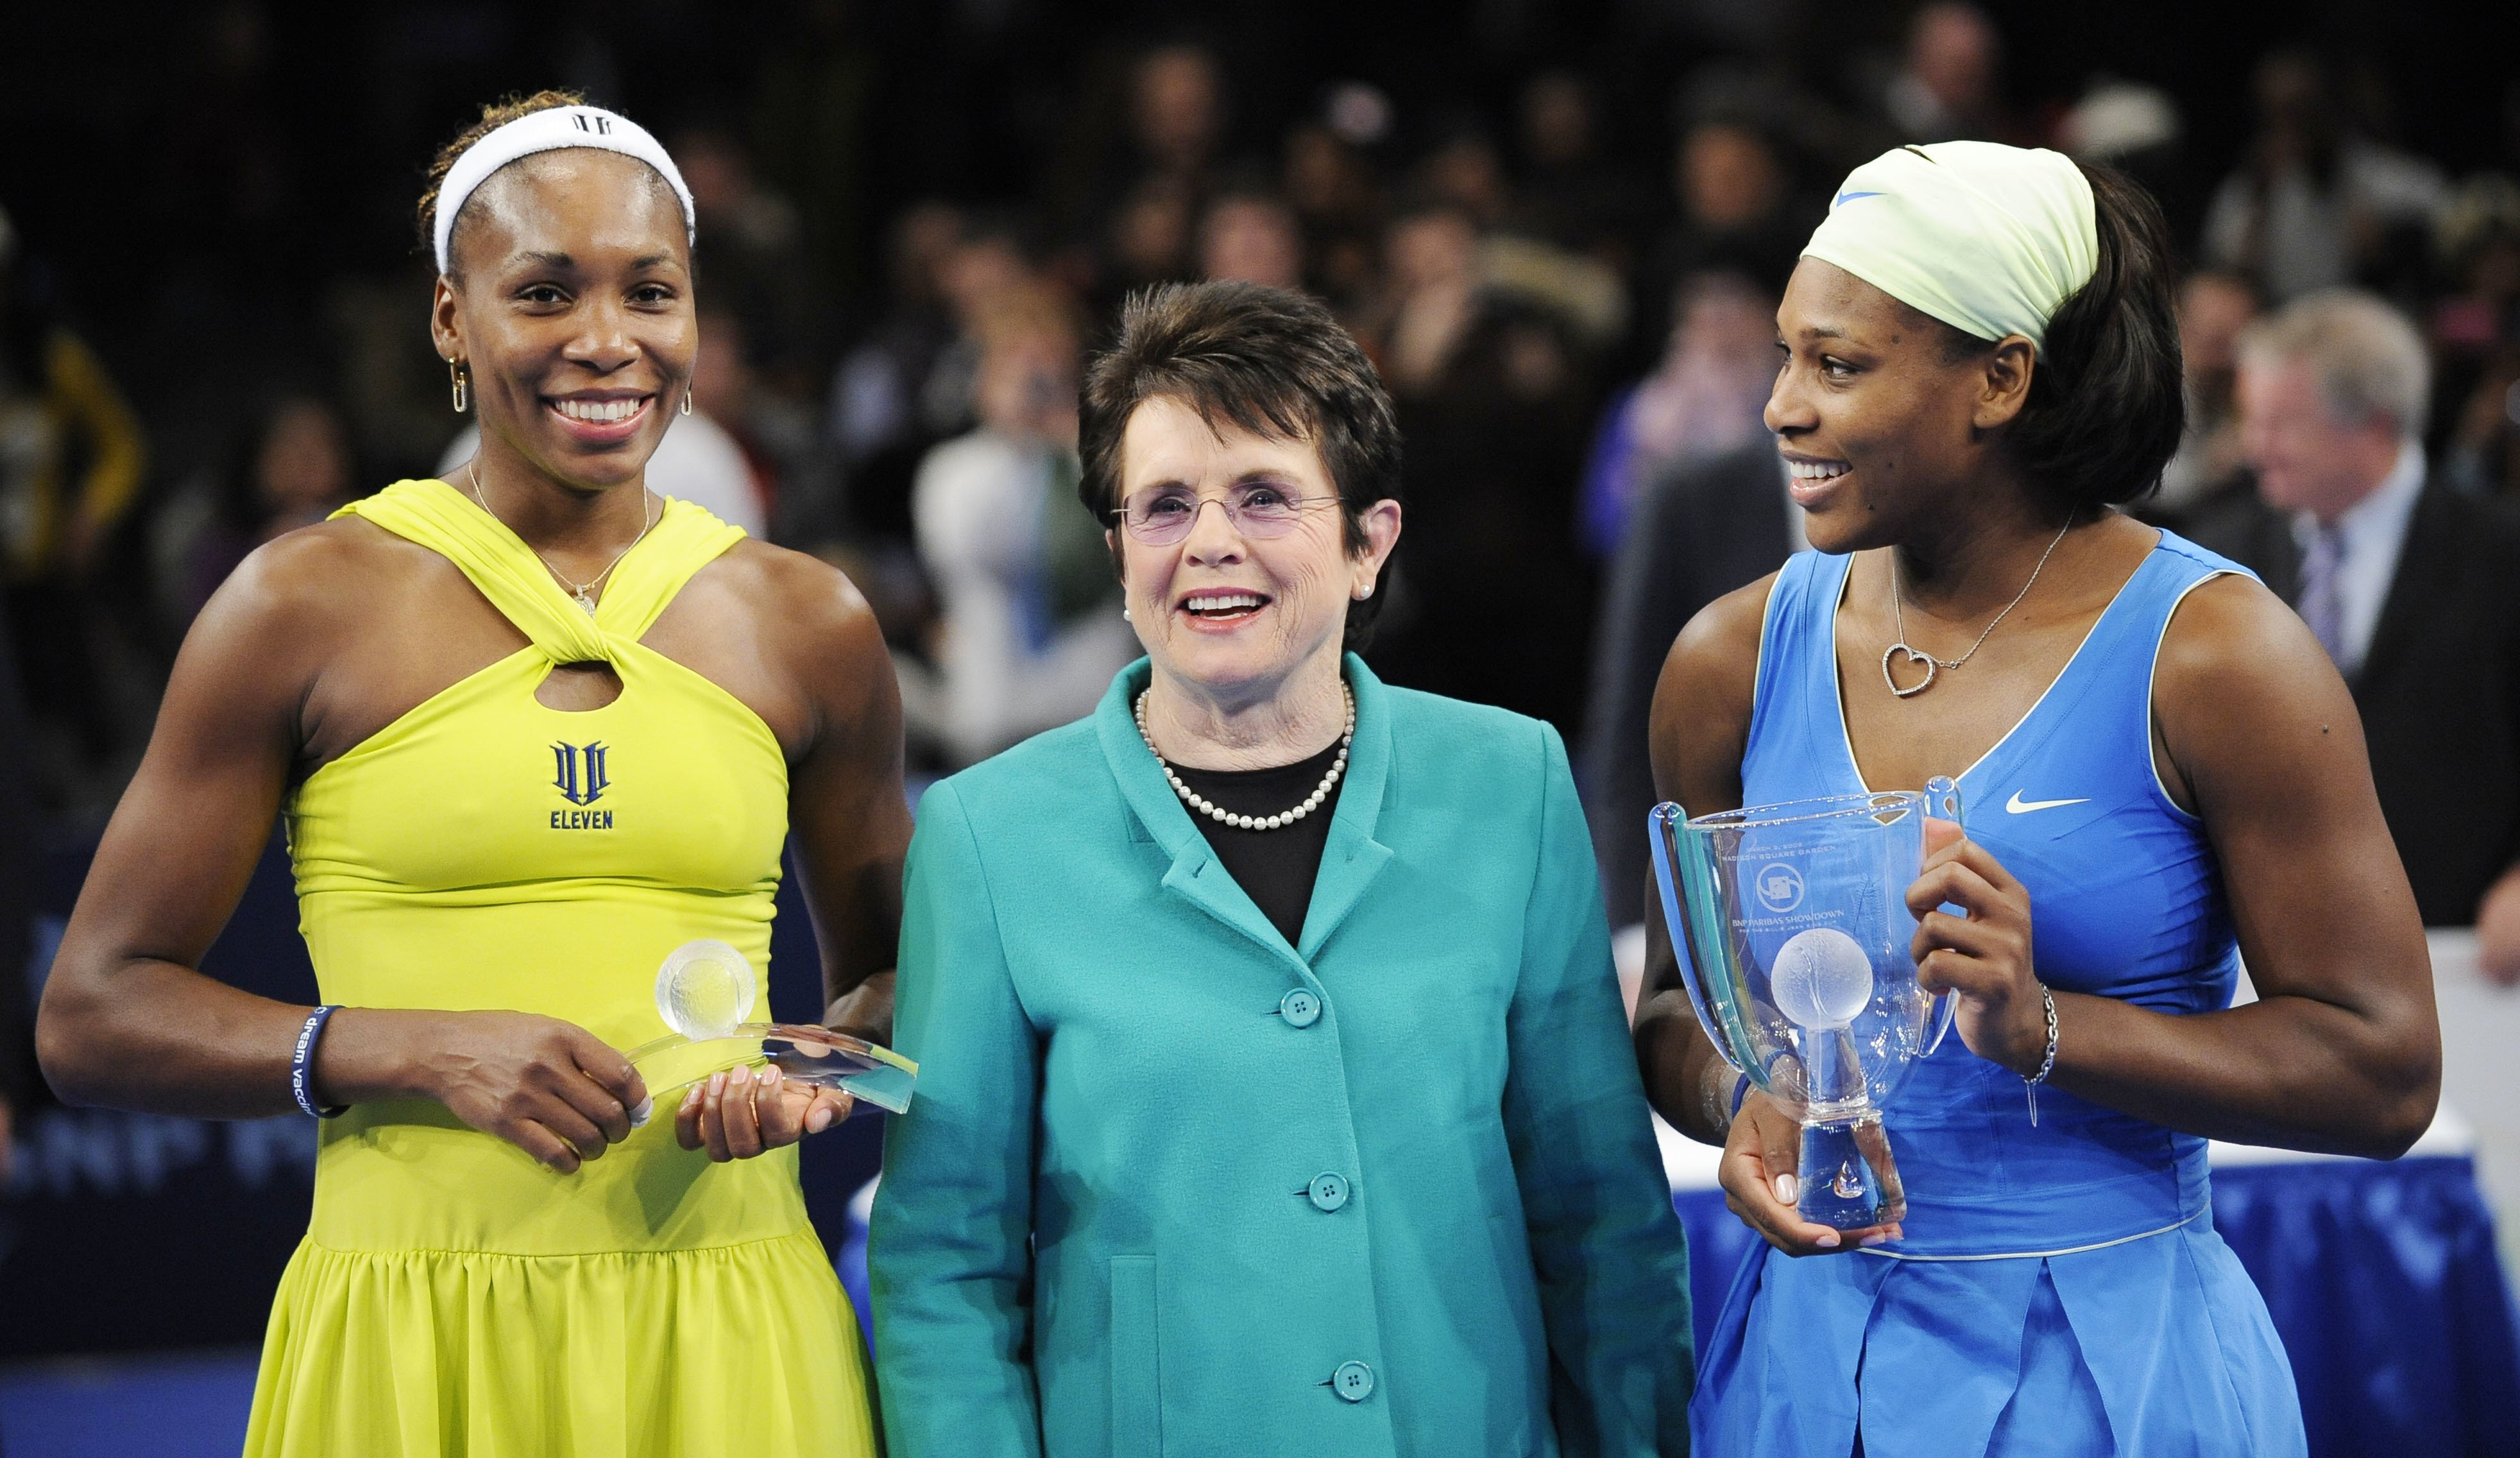 Billie Jean King Venus Williams Serena Williams thegrio.com